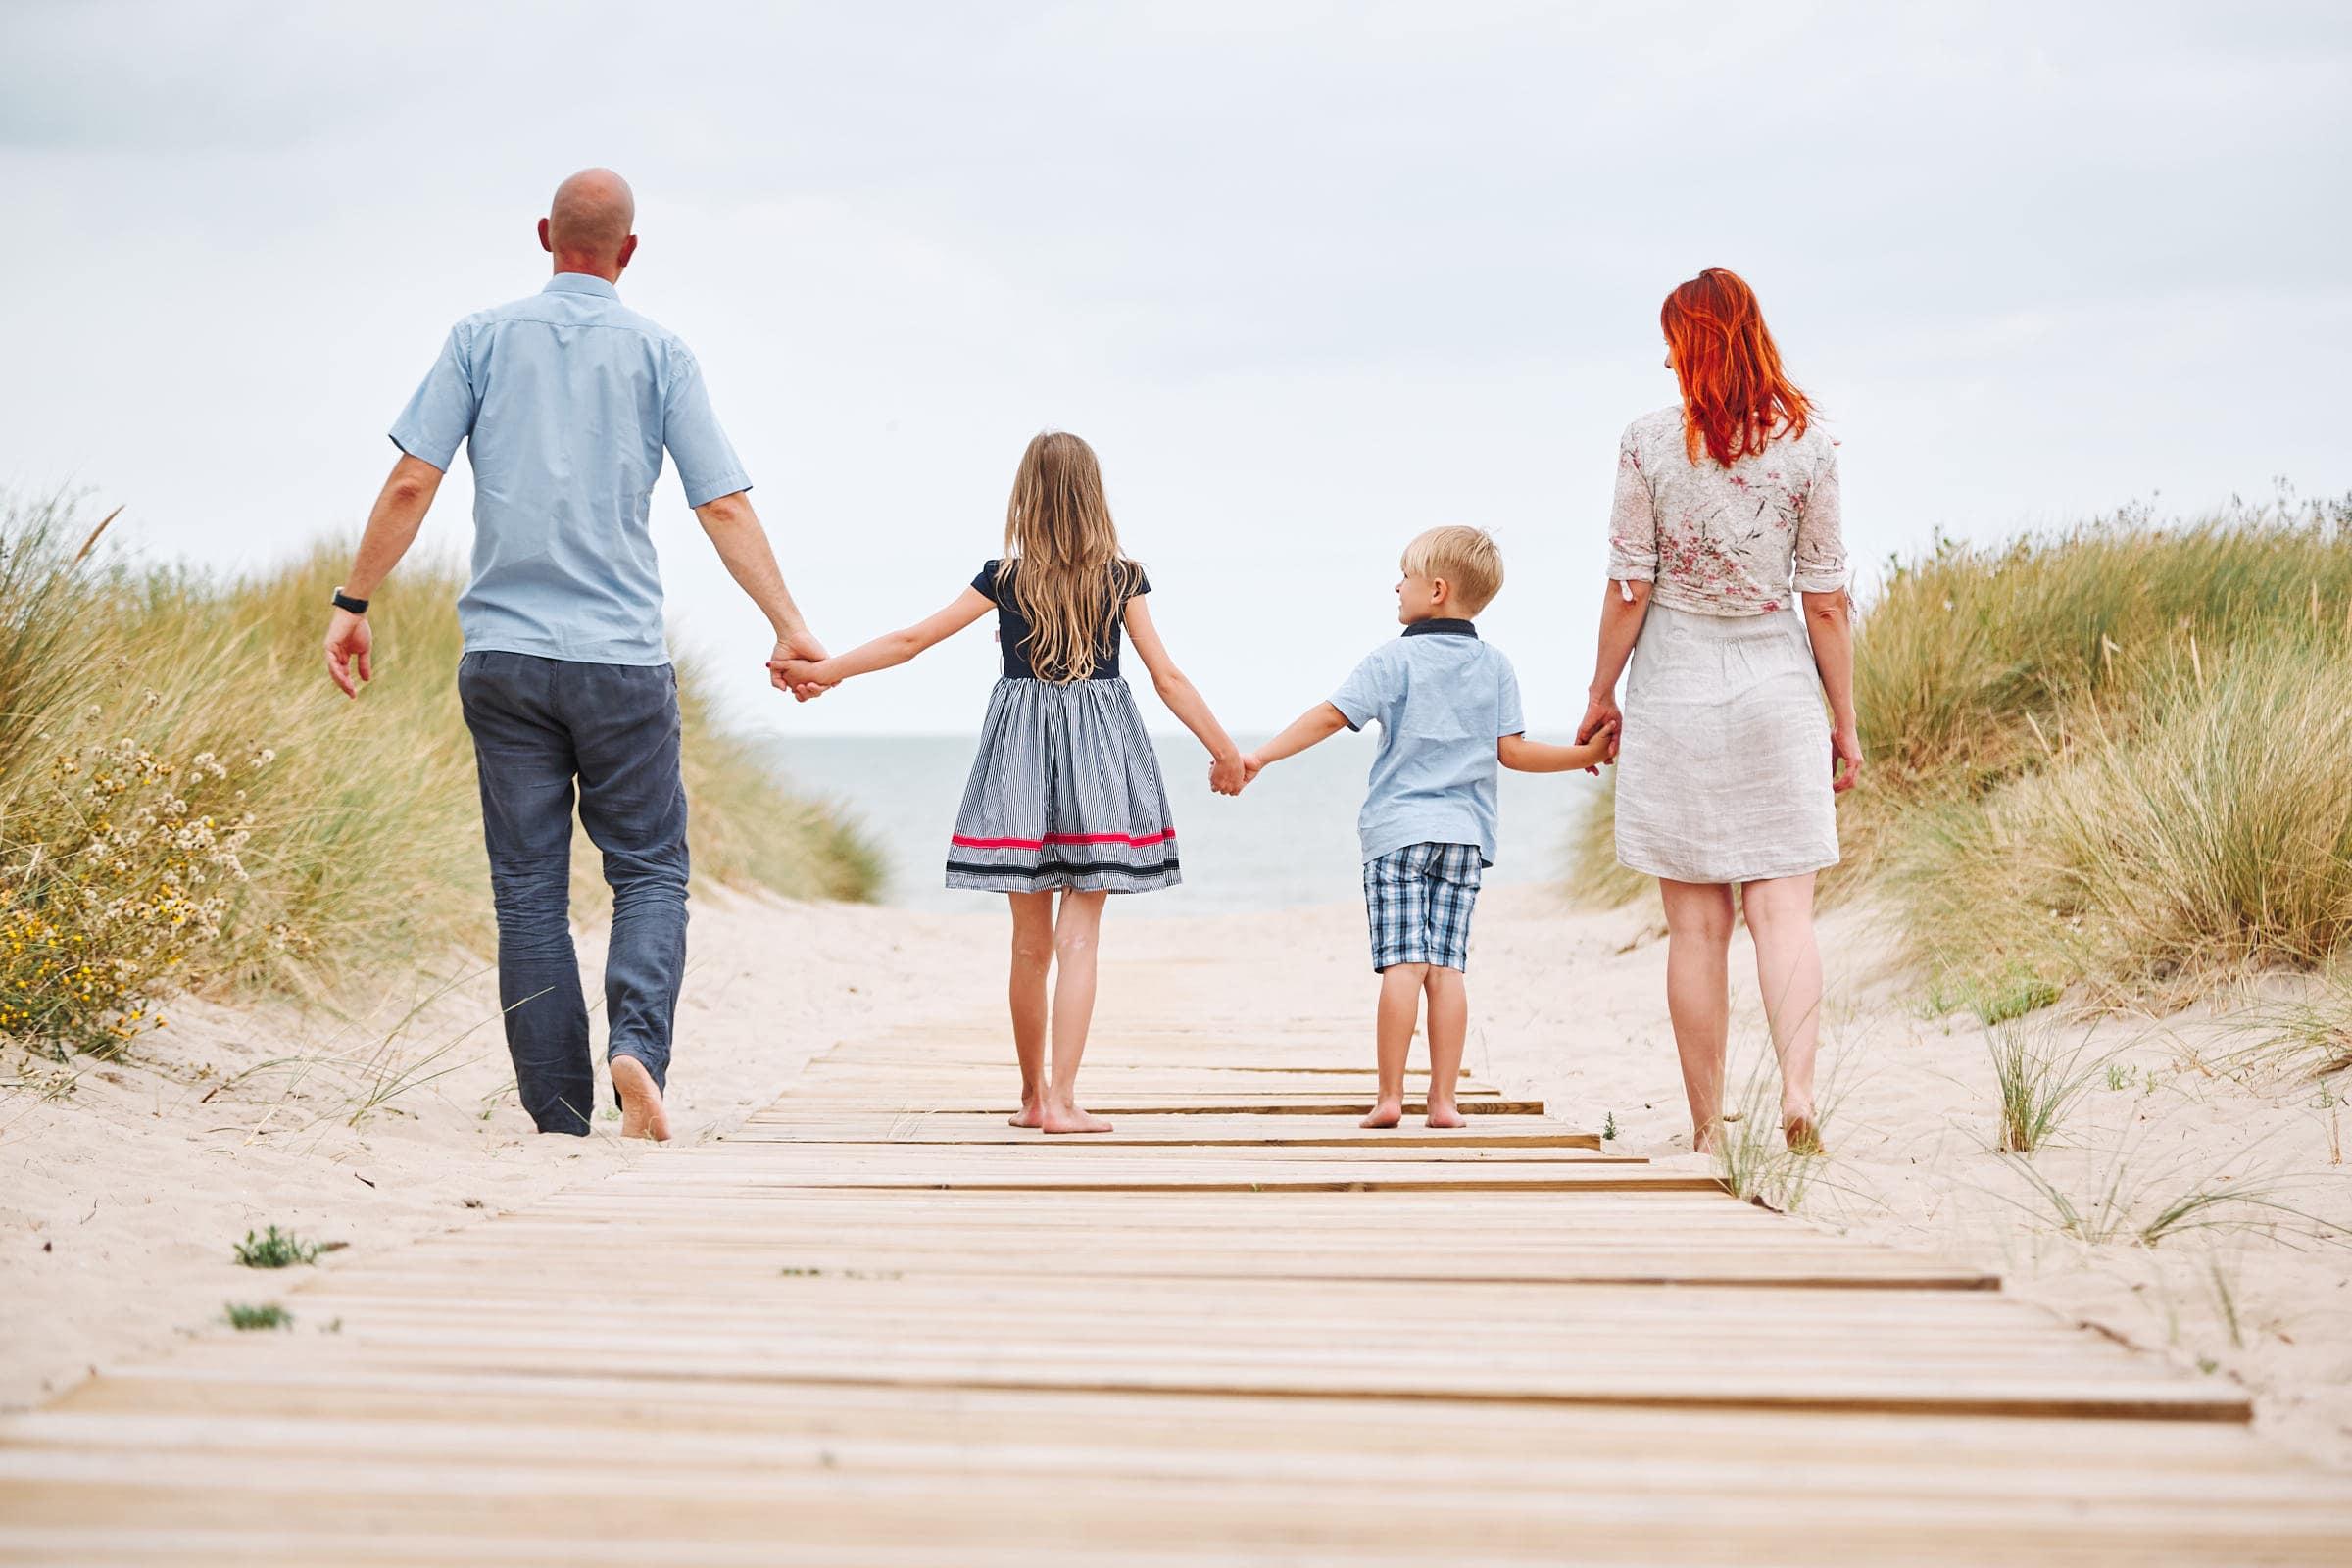 familienfoto am strand